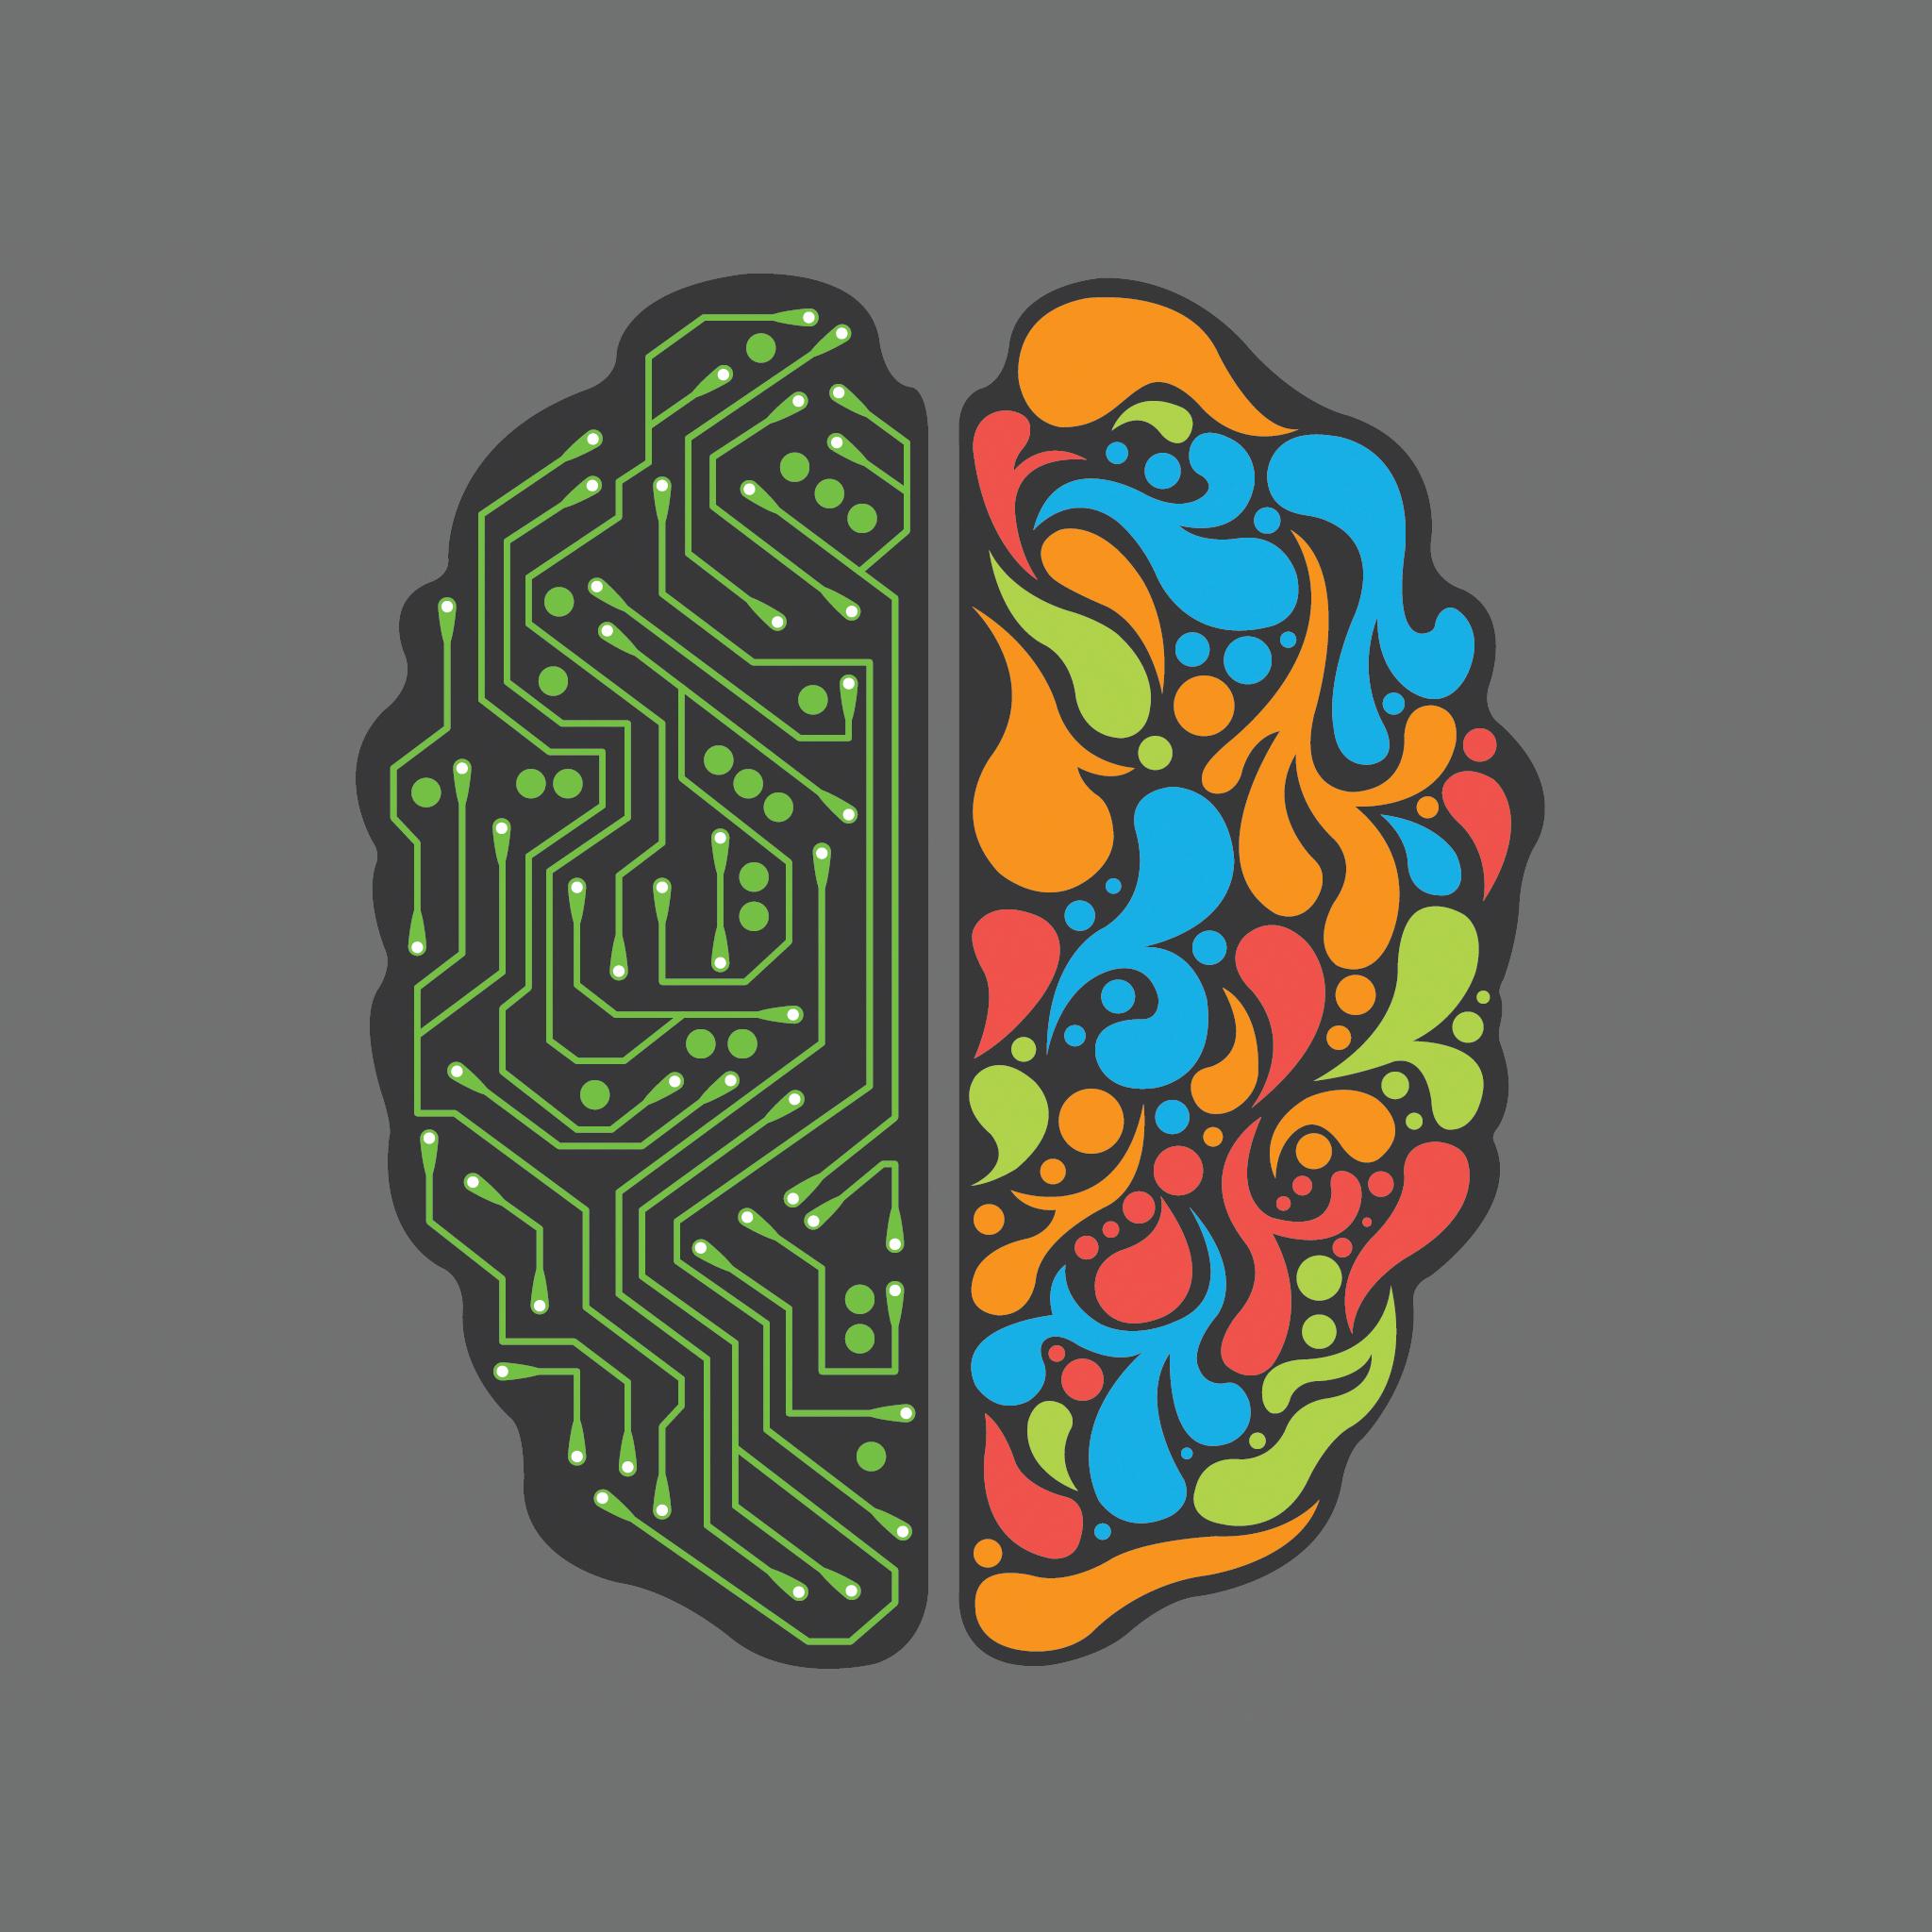 Brain-2.0-3Wallpapers-iPad-Retina